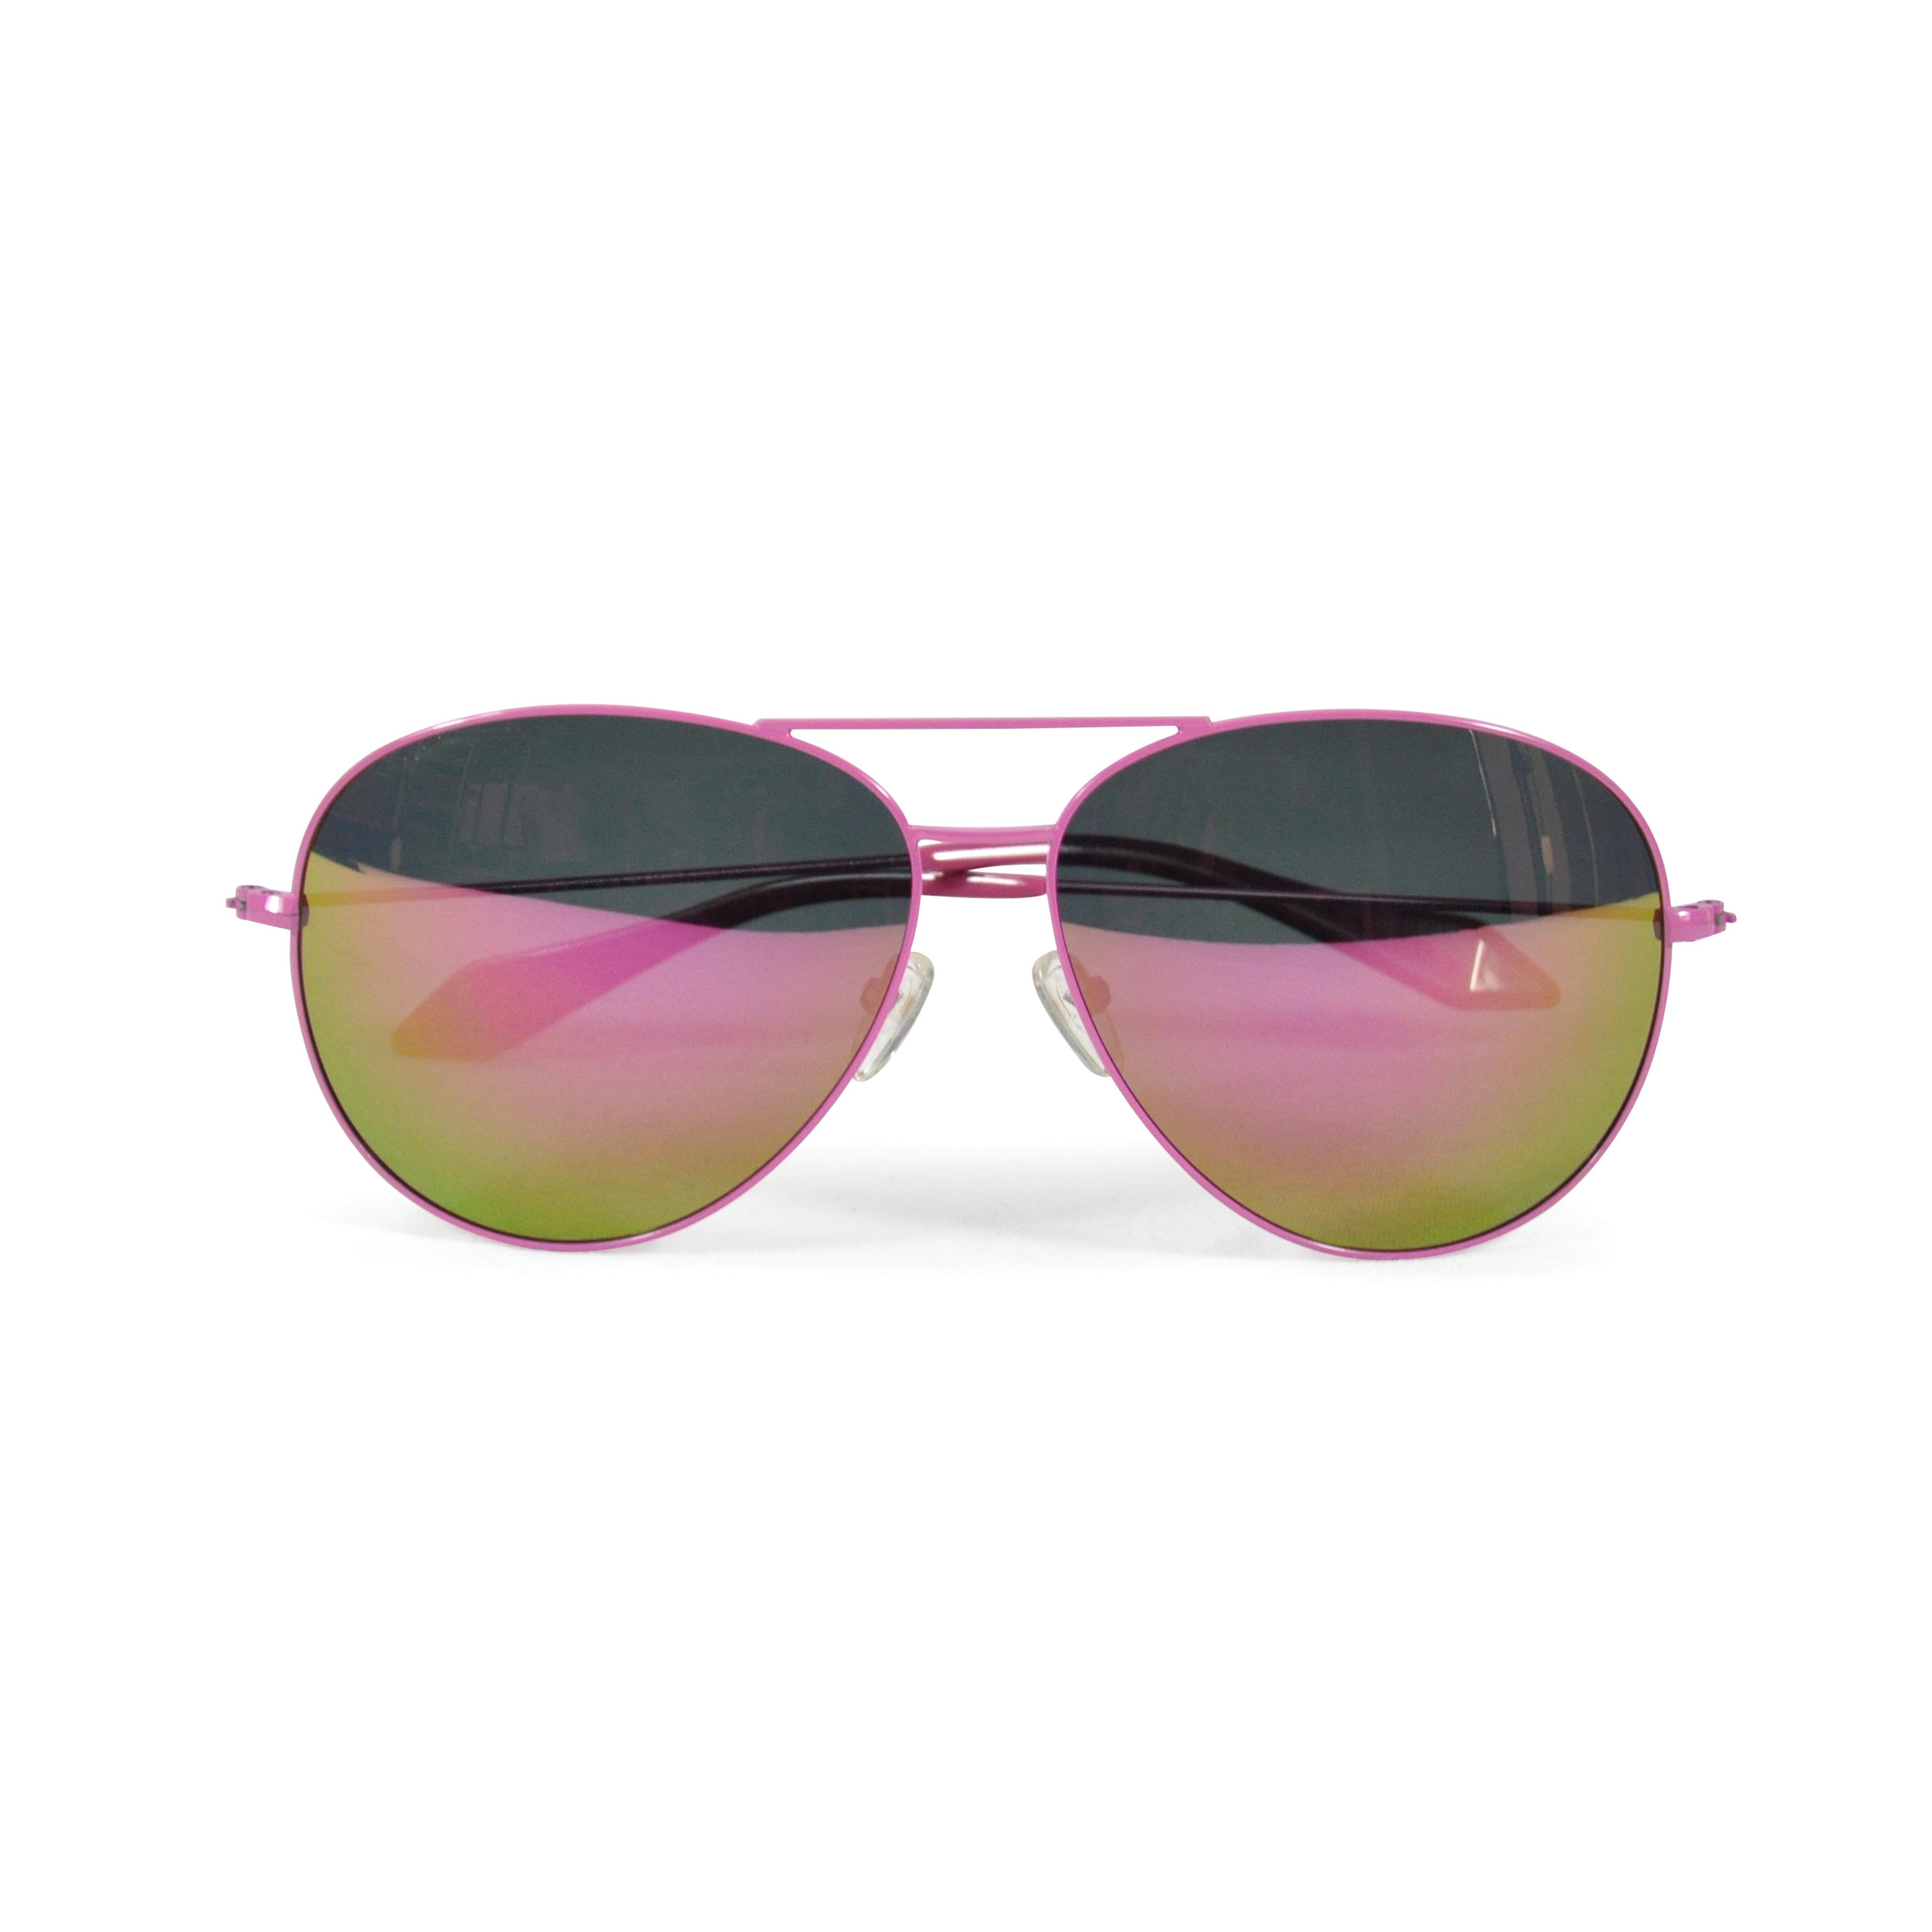 91f8f05bc1c9f Authentic Second Hand Victoria Beckham Classic Victoria Mirror Aviator  Sunglasses (PSS-200-00392)